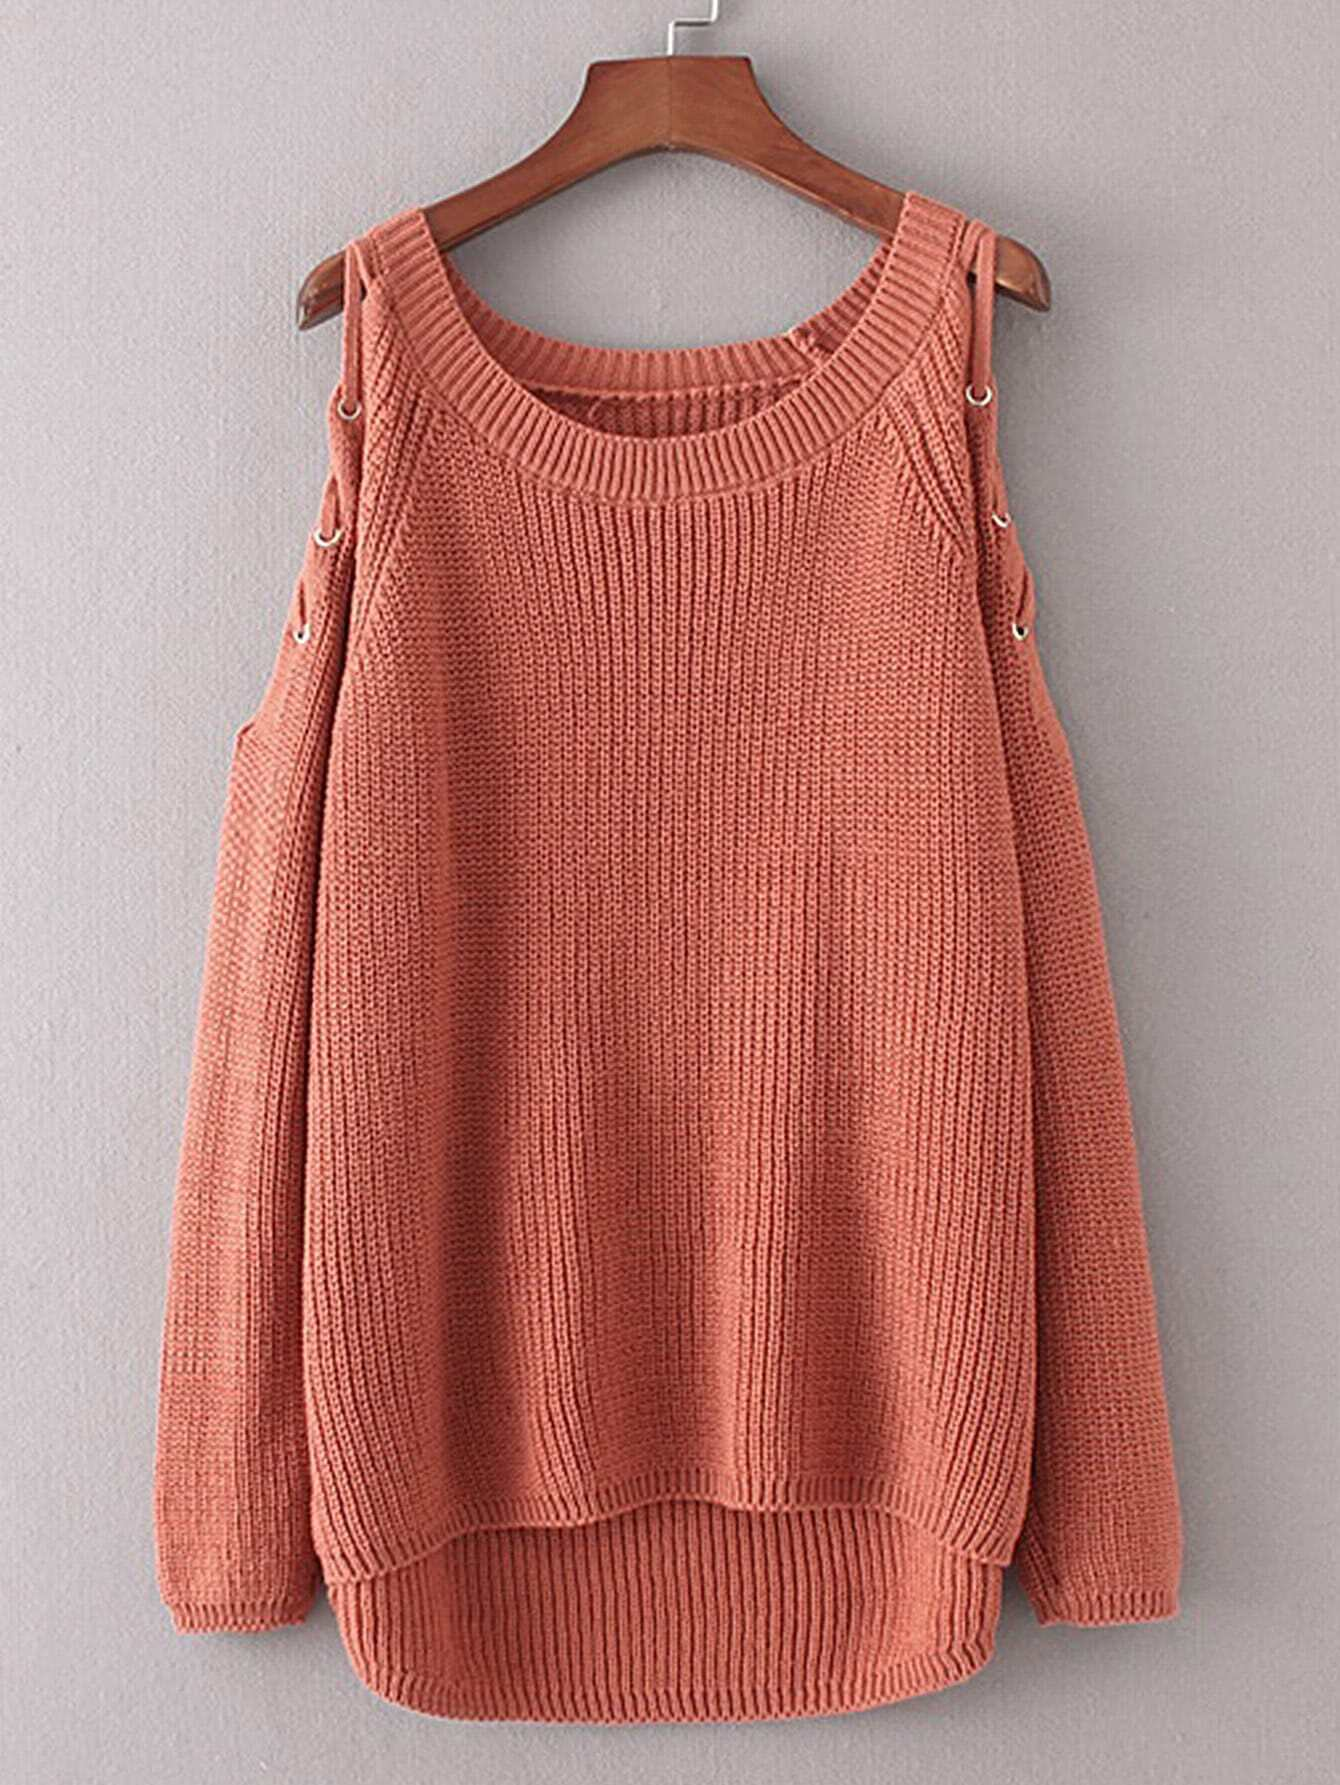 Lace Up Shoulder Dip Hem Sweater sweater170818210